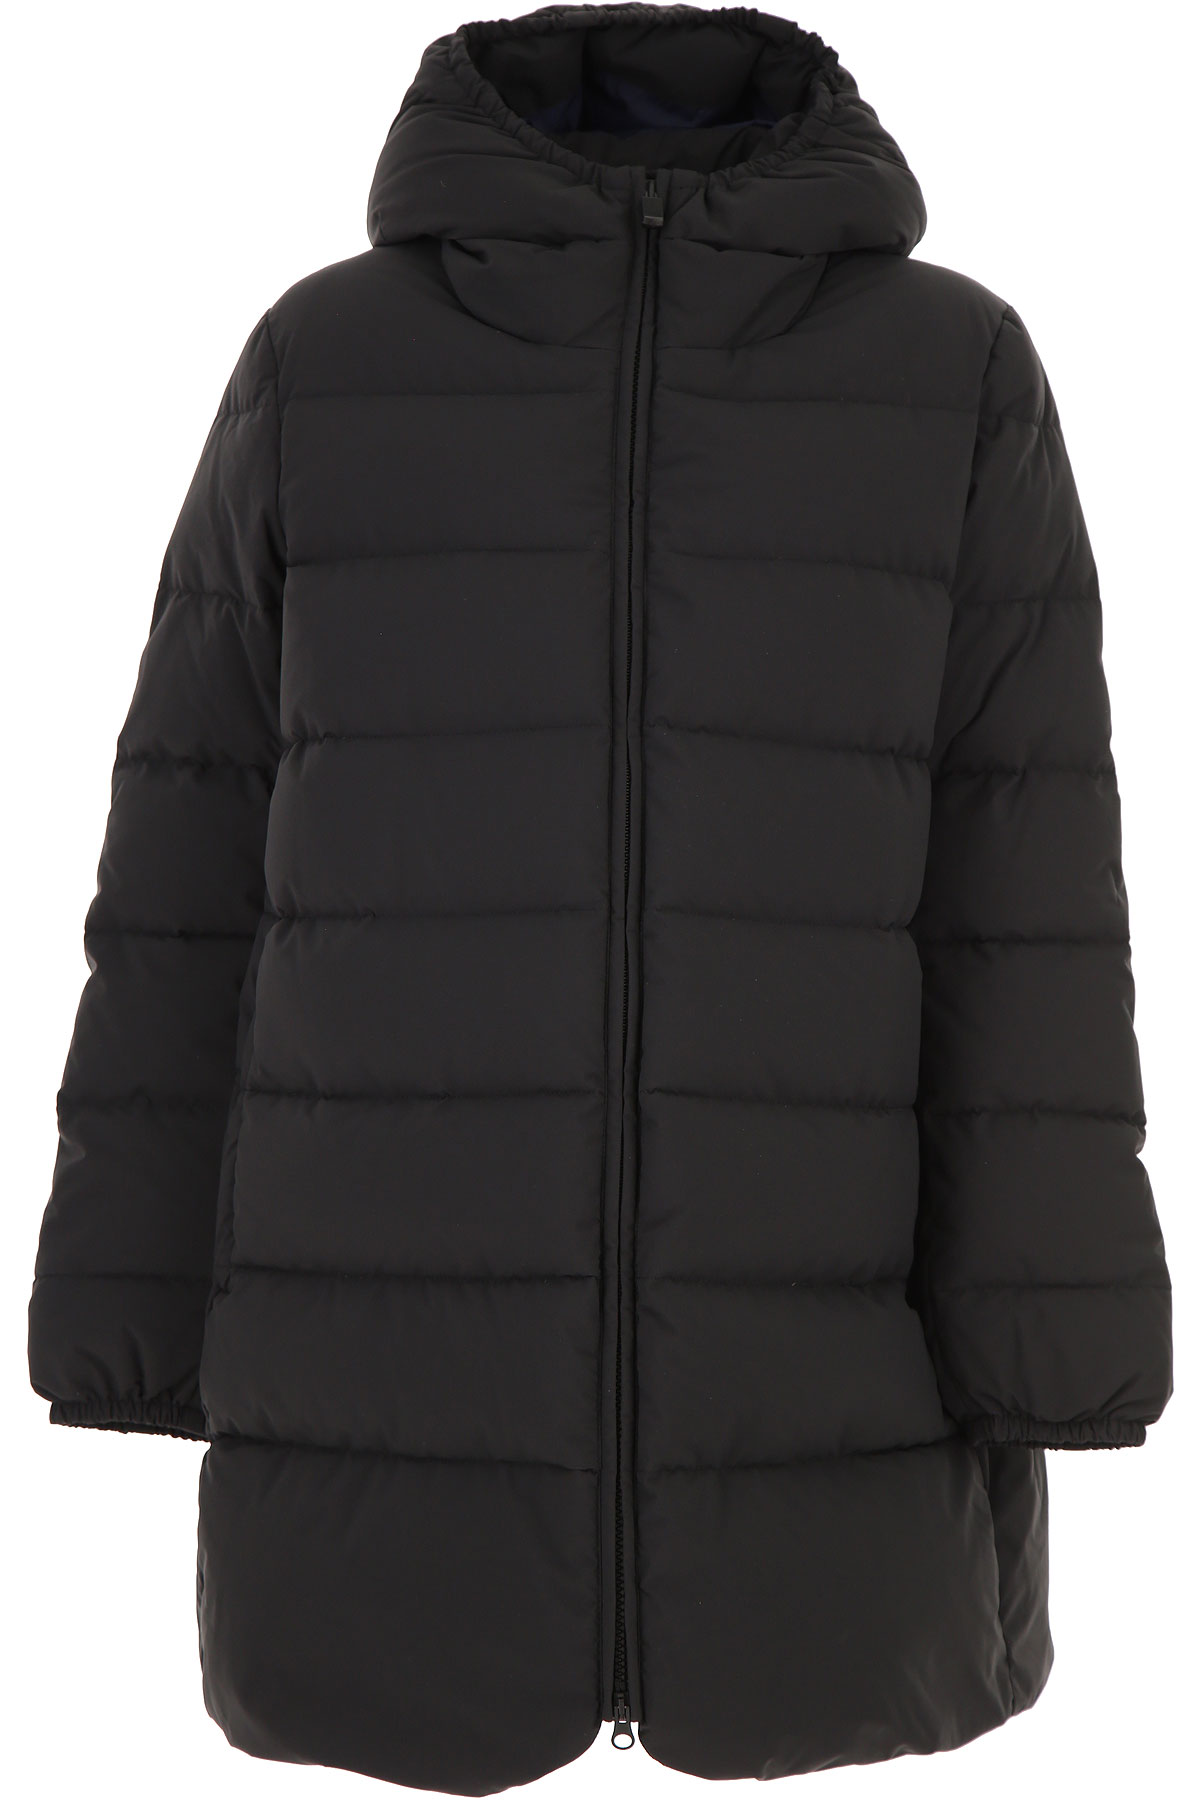 Aspesi Down Jacket for Women, Puffer Ski Jacket On Sale, Black, Nylon, 2019, 2 4 6